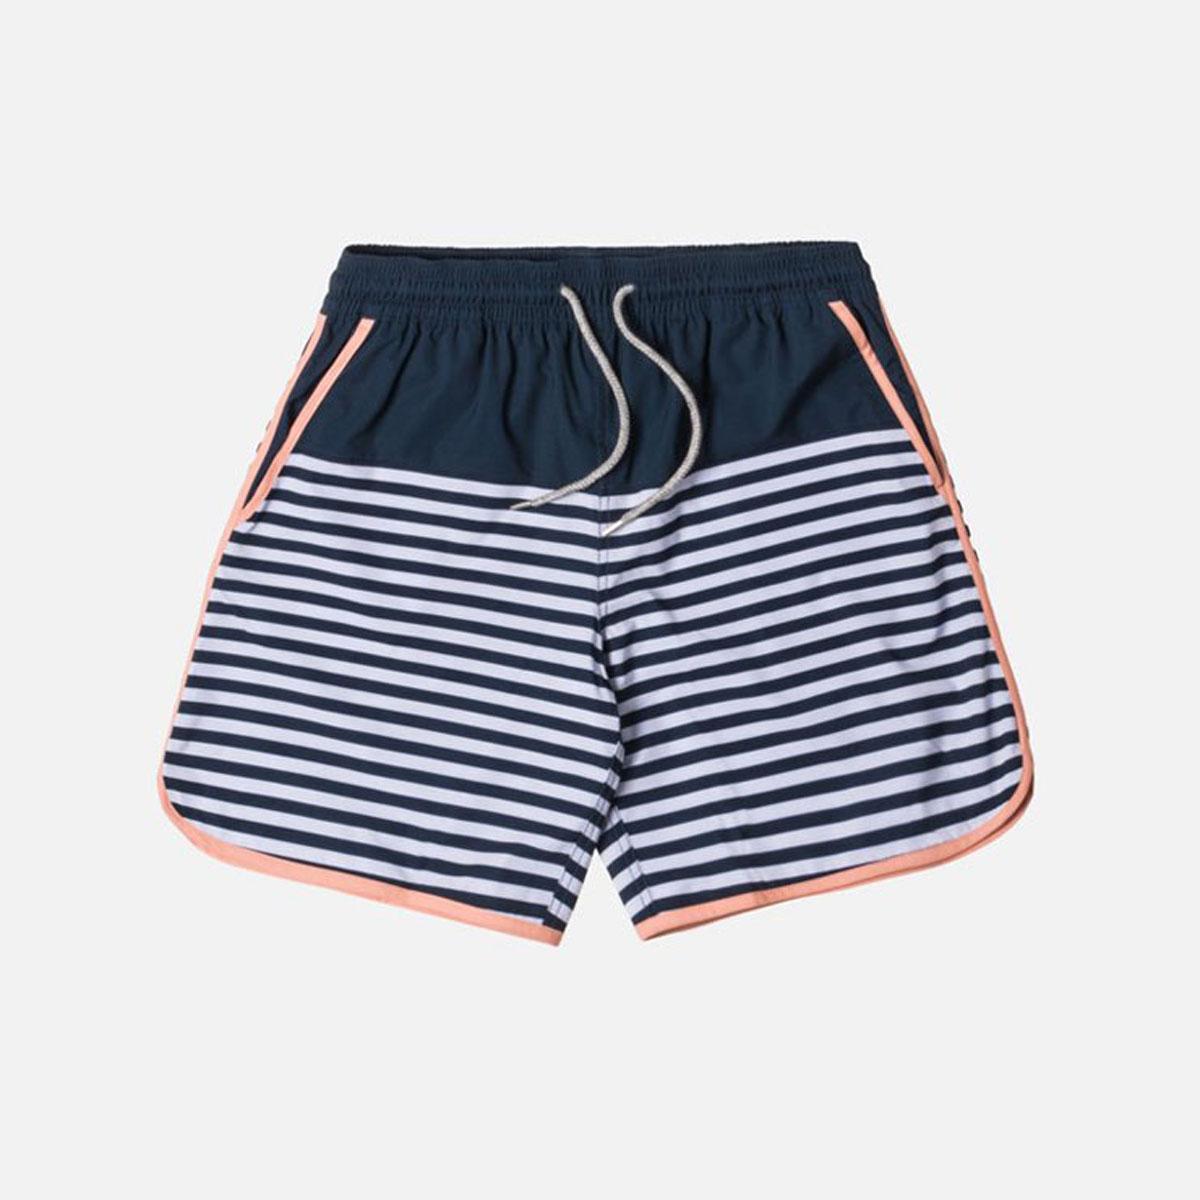 85304be93c ... Kiss KITH regular article men swimsuit swimming underwear KITH ROCKAWAY  SHORT KH7002-102 NAVY ...